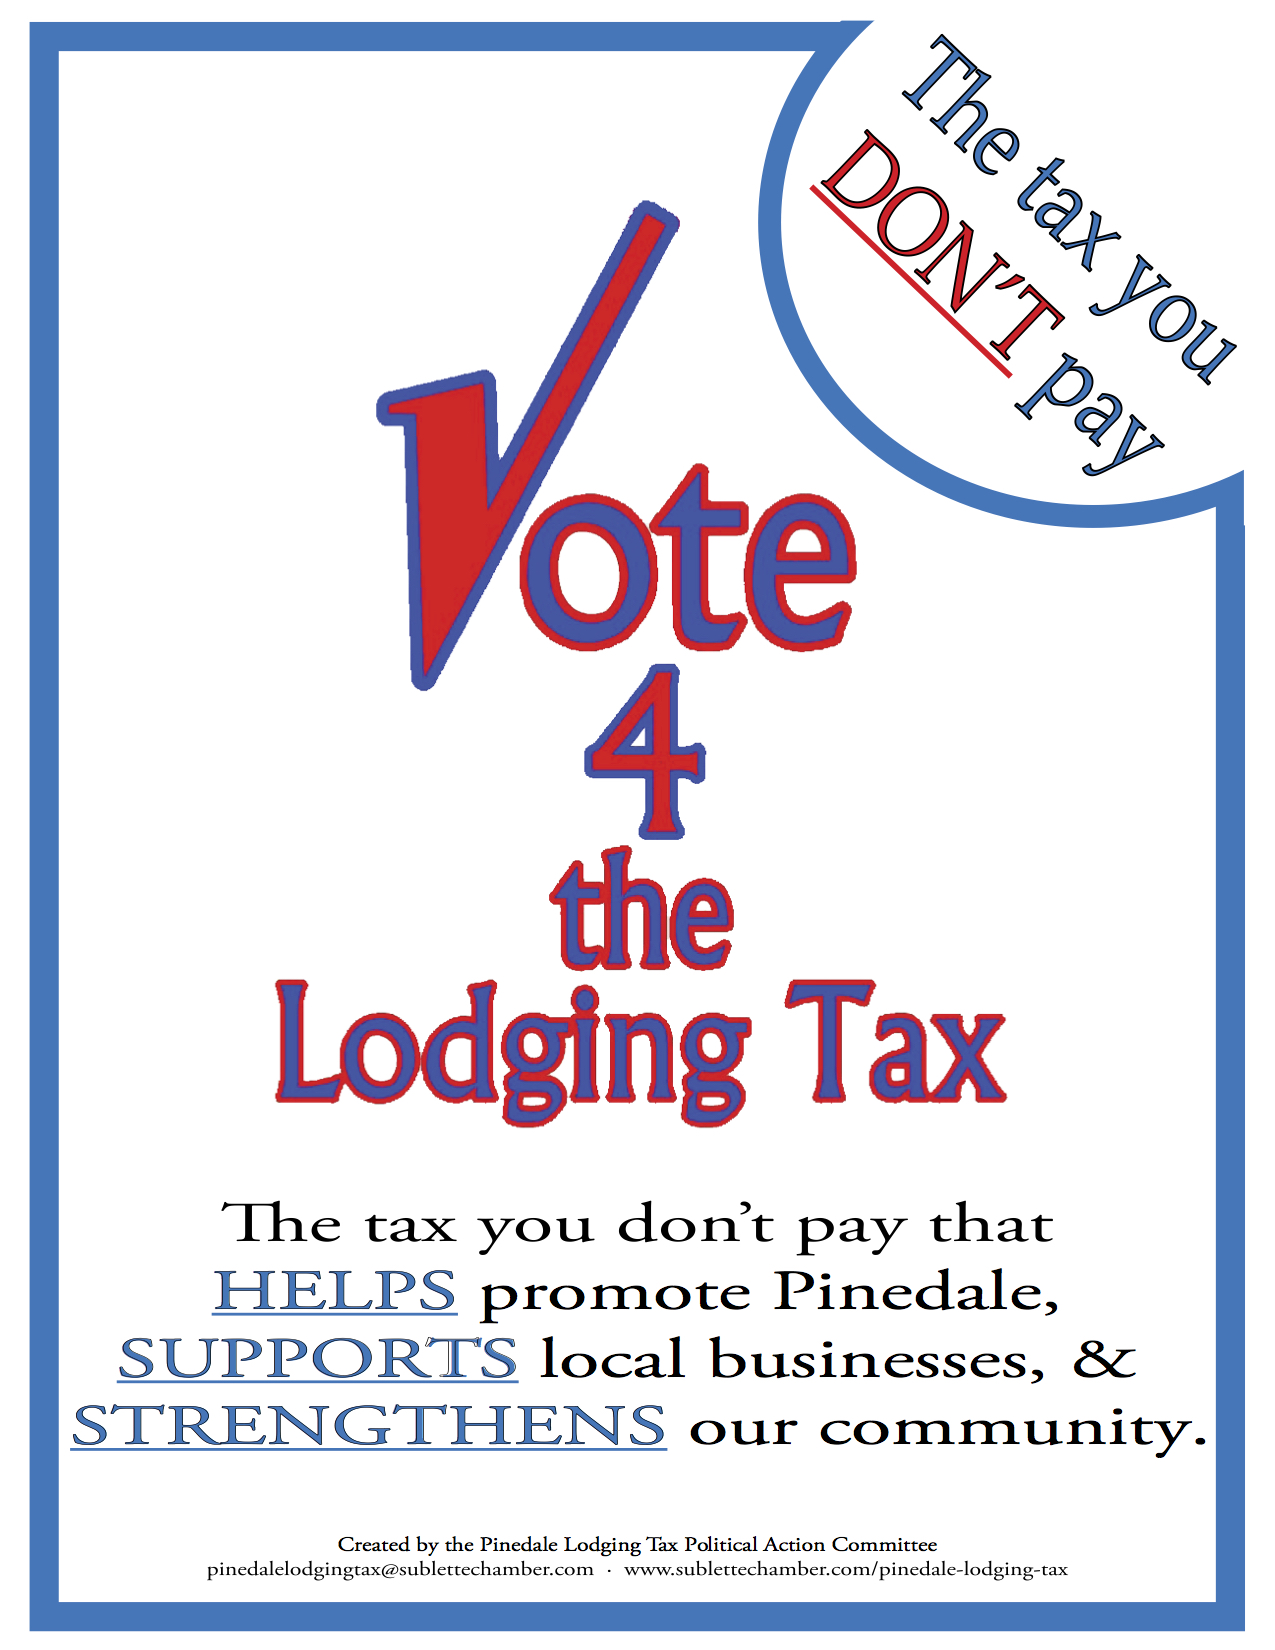 Lodging-Tax-flyer-8.5-x-11.jpg